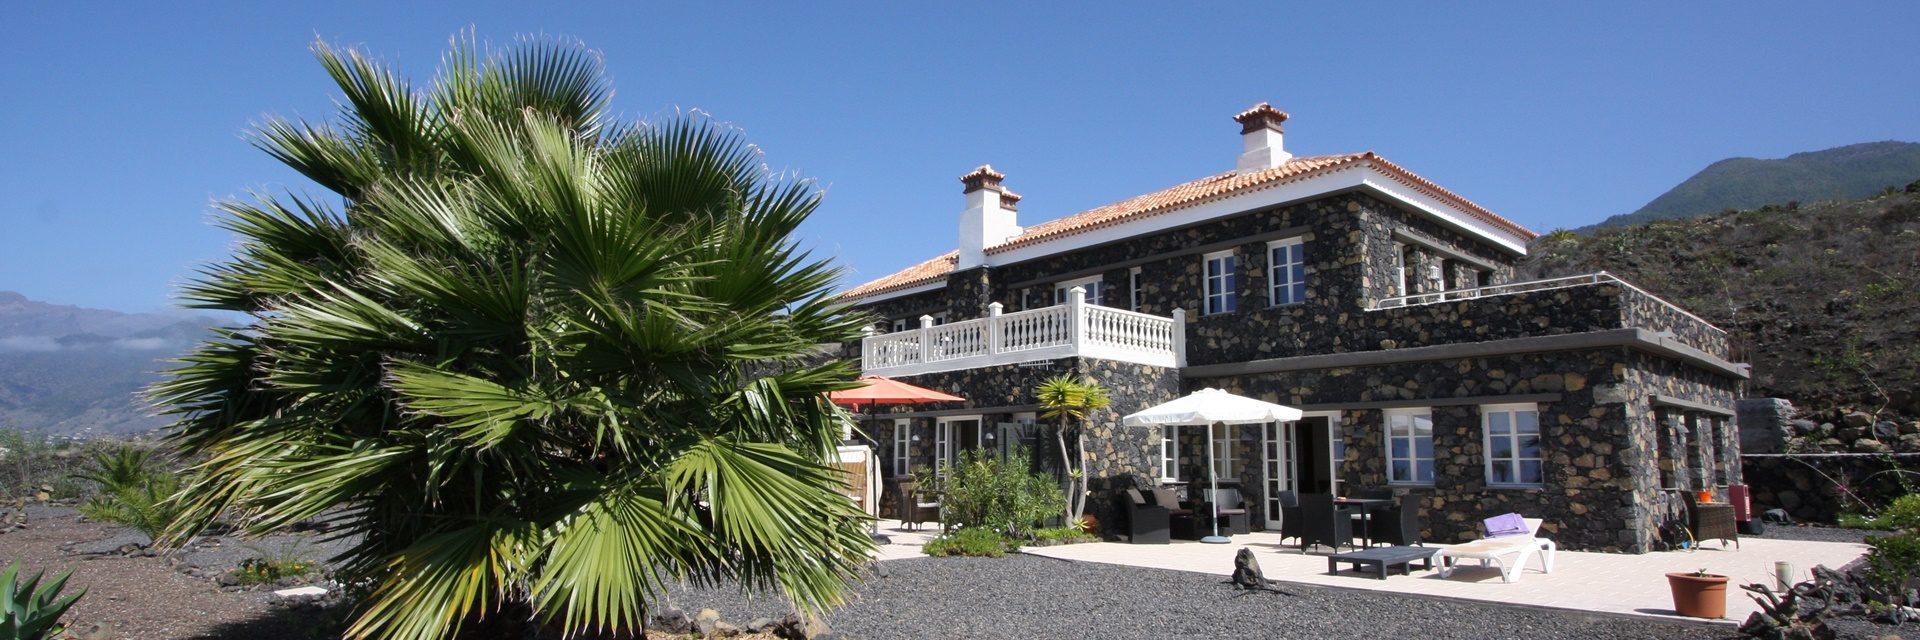 Caldera Balans Travel La Palma